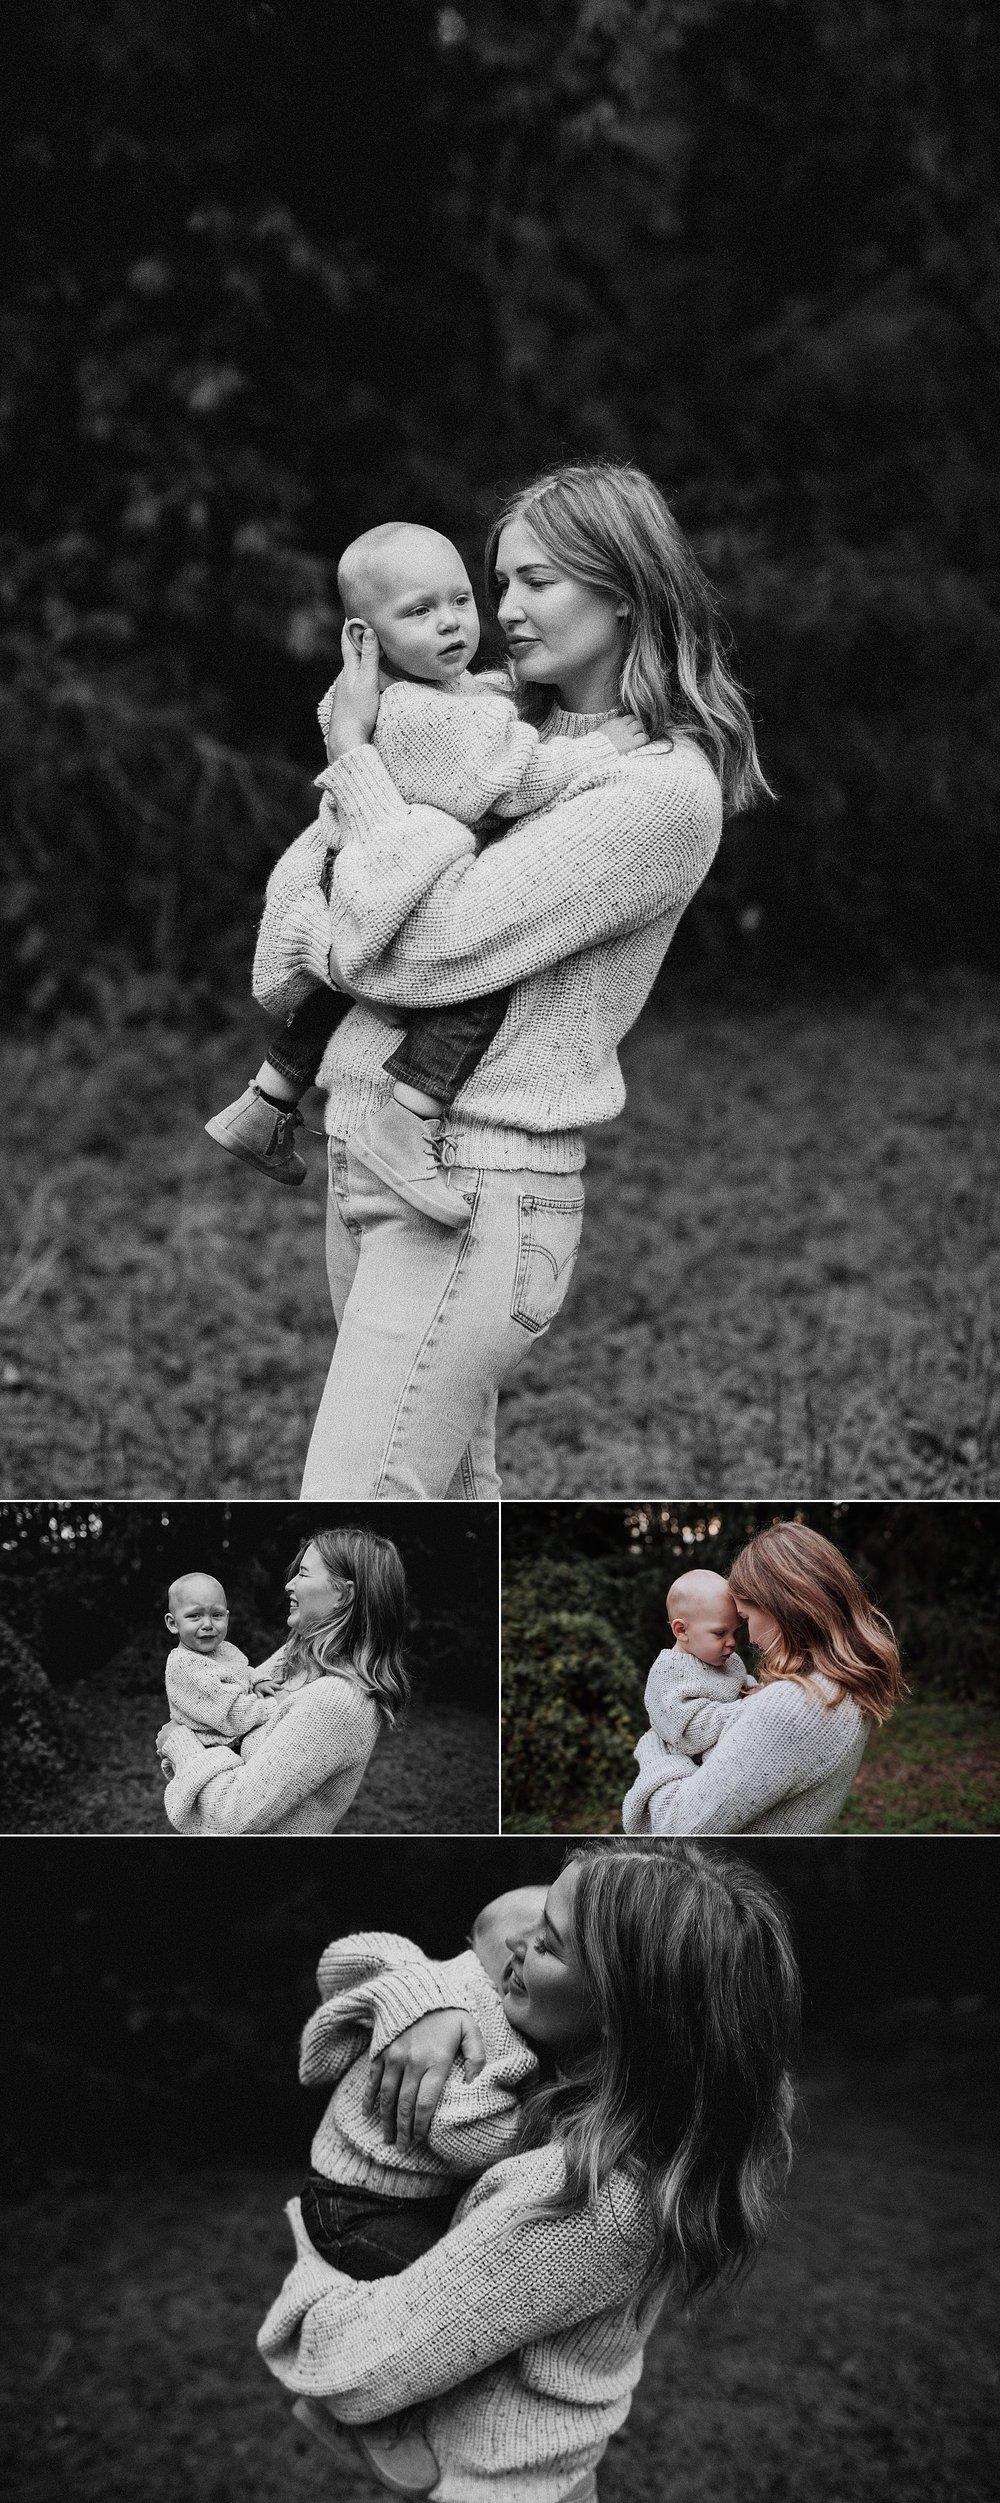 Sebastopol Family Photography   Gretchen Gause   #bayareafamilyphotographer #Doen #Mamaandme #stlyishmama #mamaandbaby #shopdoen #familyphotos